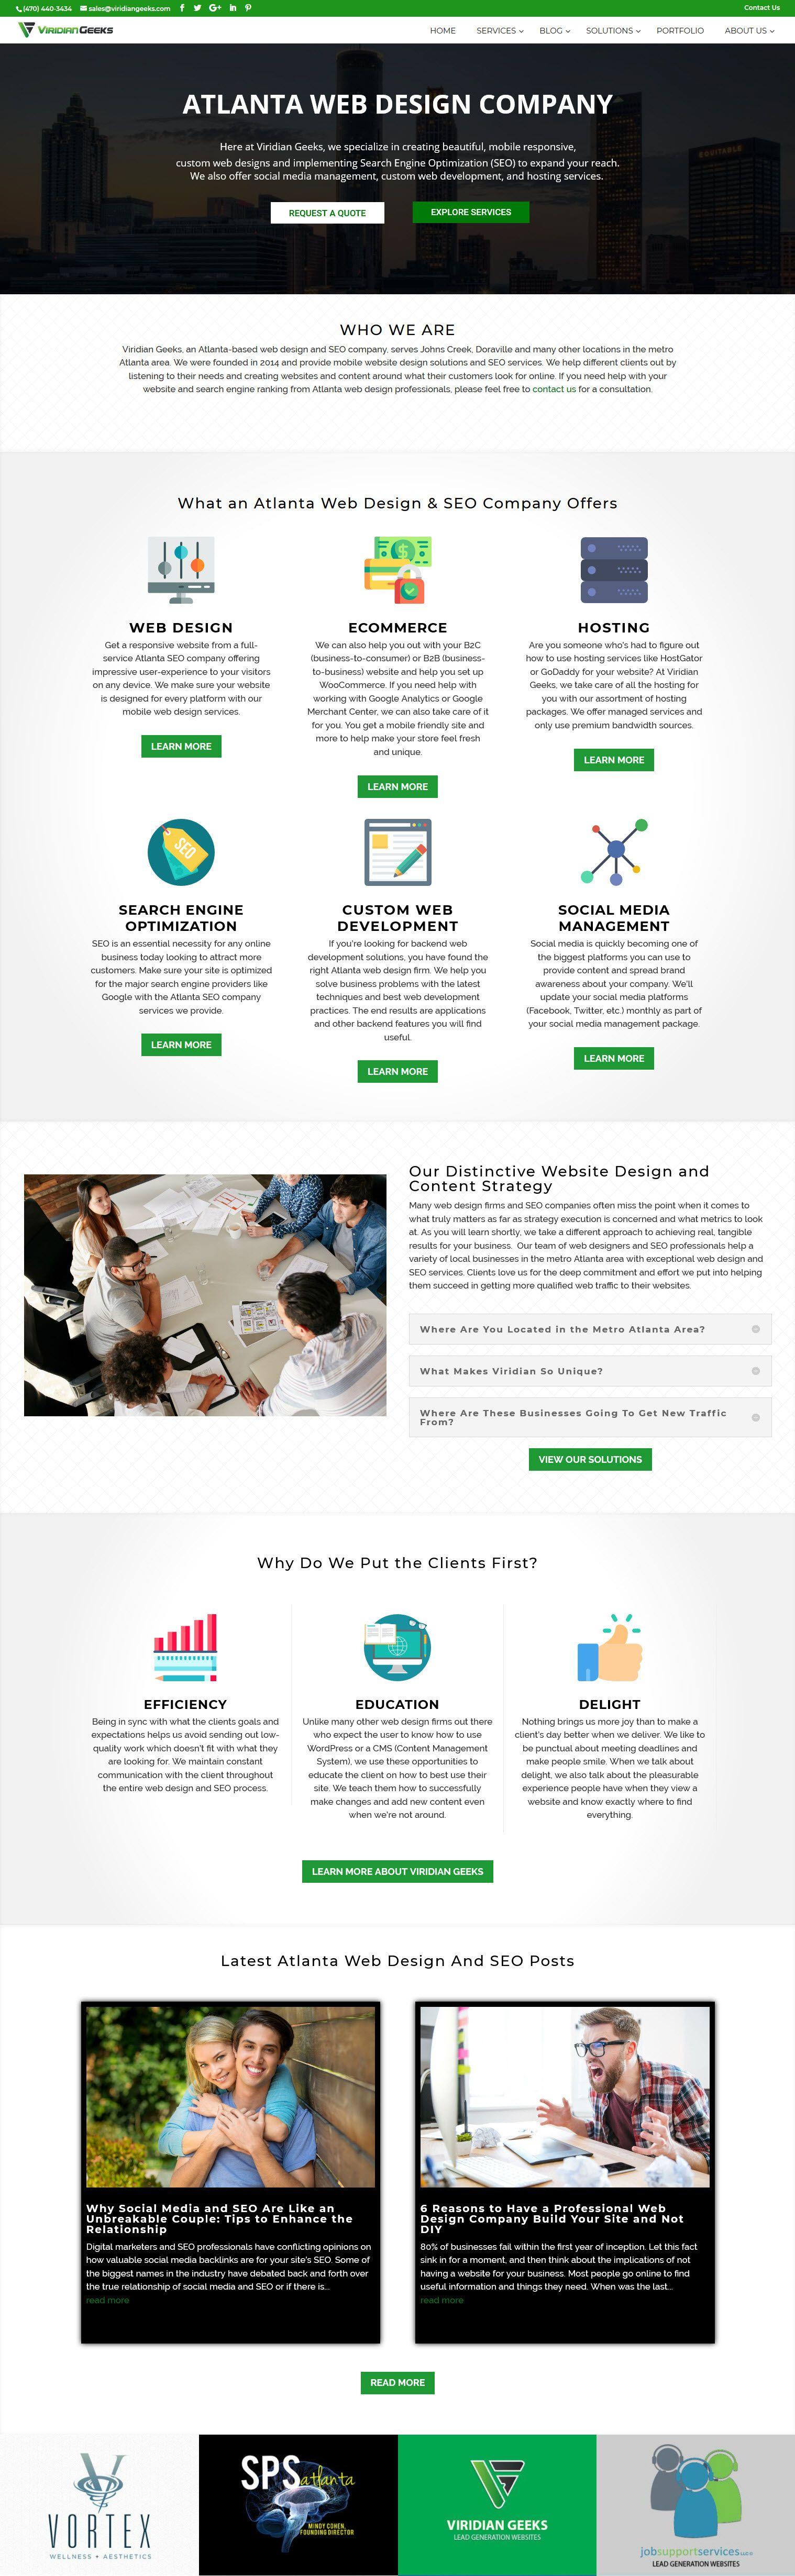 website for geeks